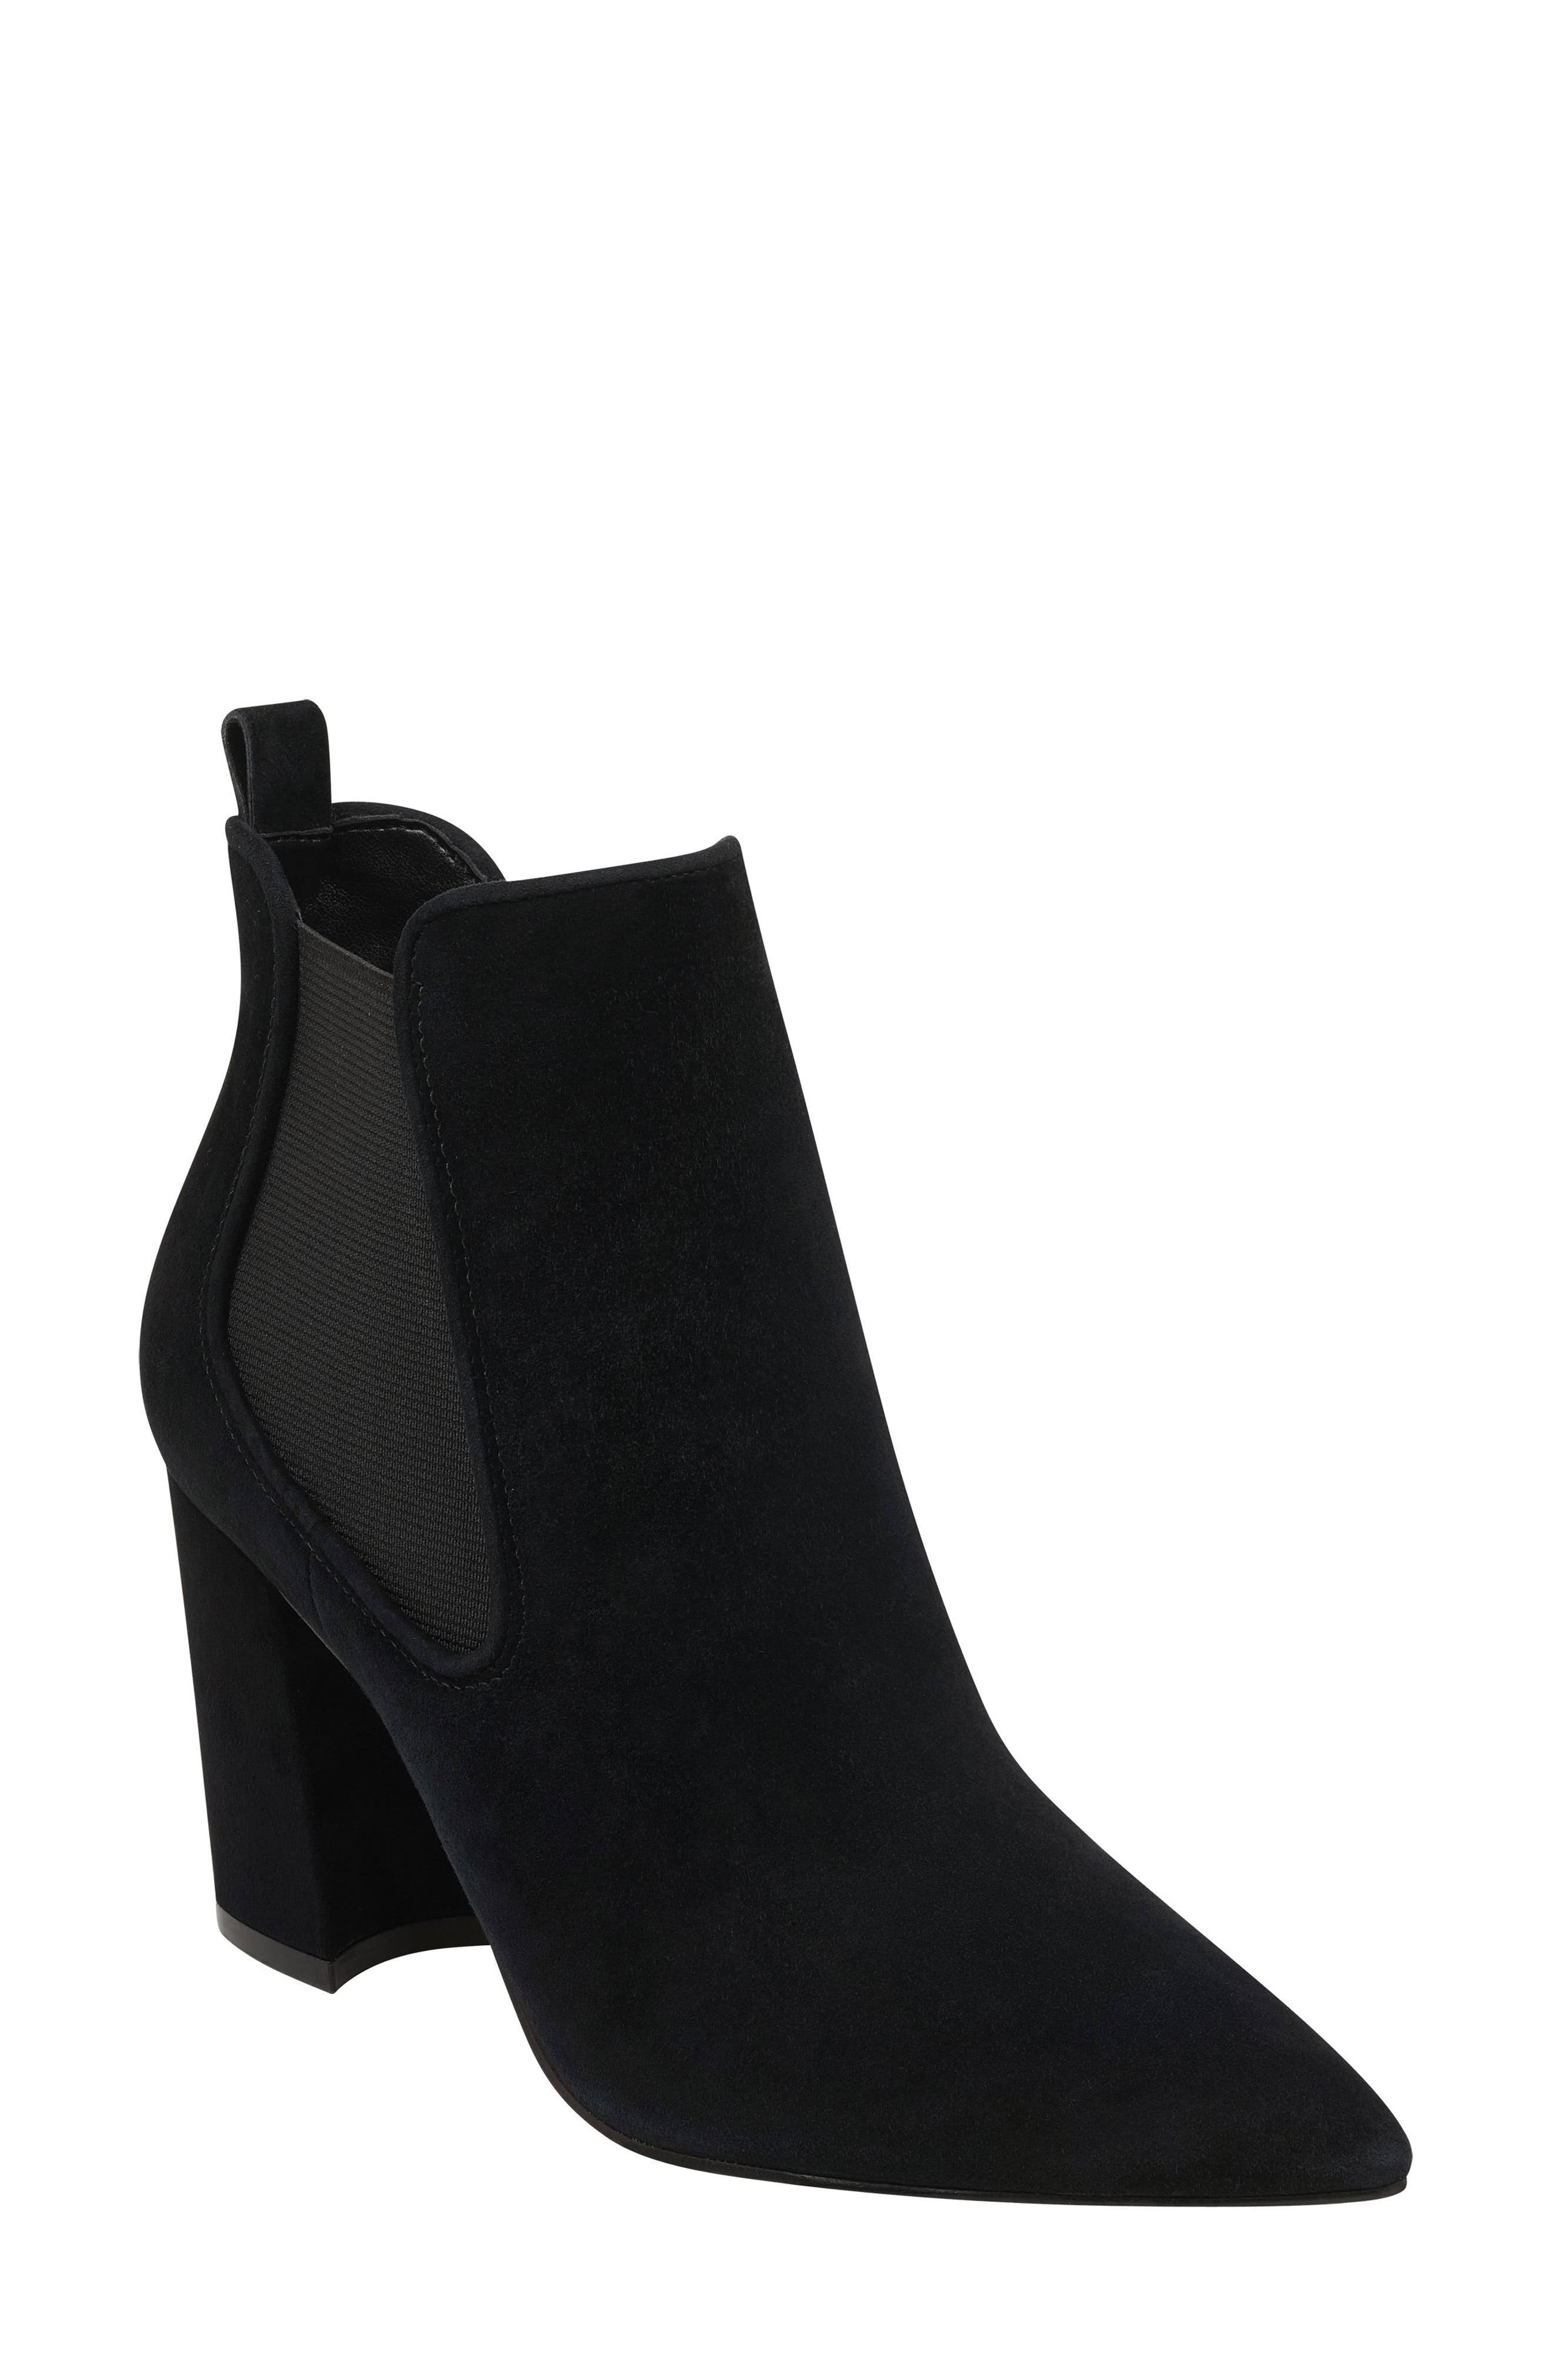 Marc Fisher Ltd Tacily Pointy Toe Bootie- Black